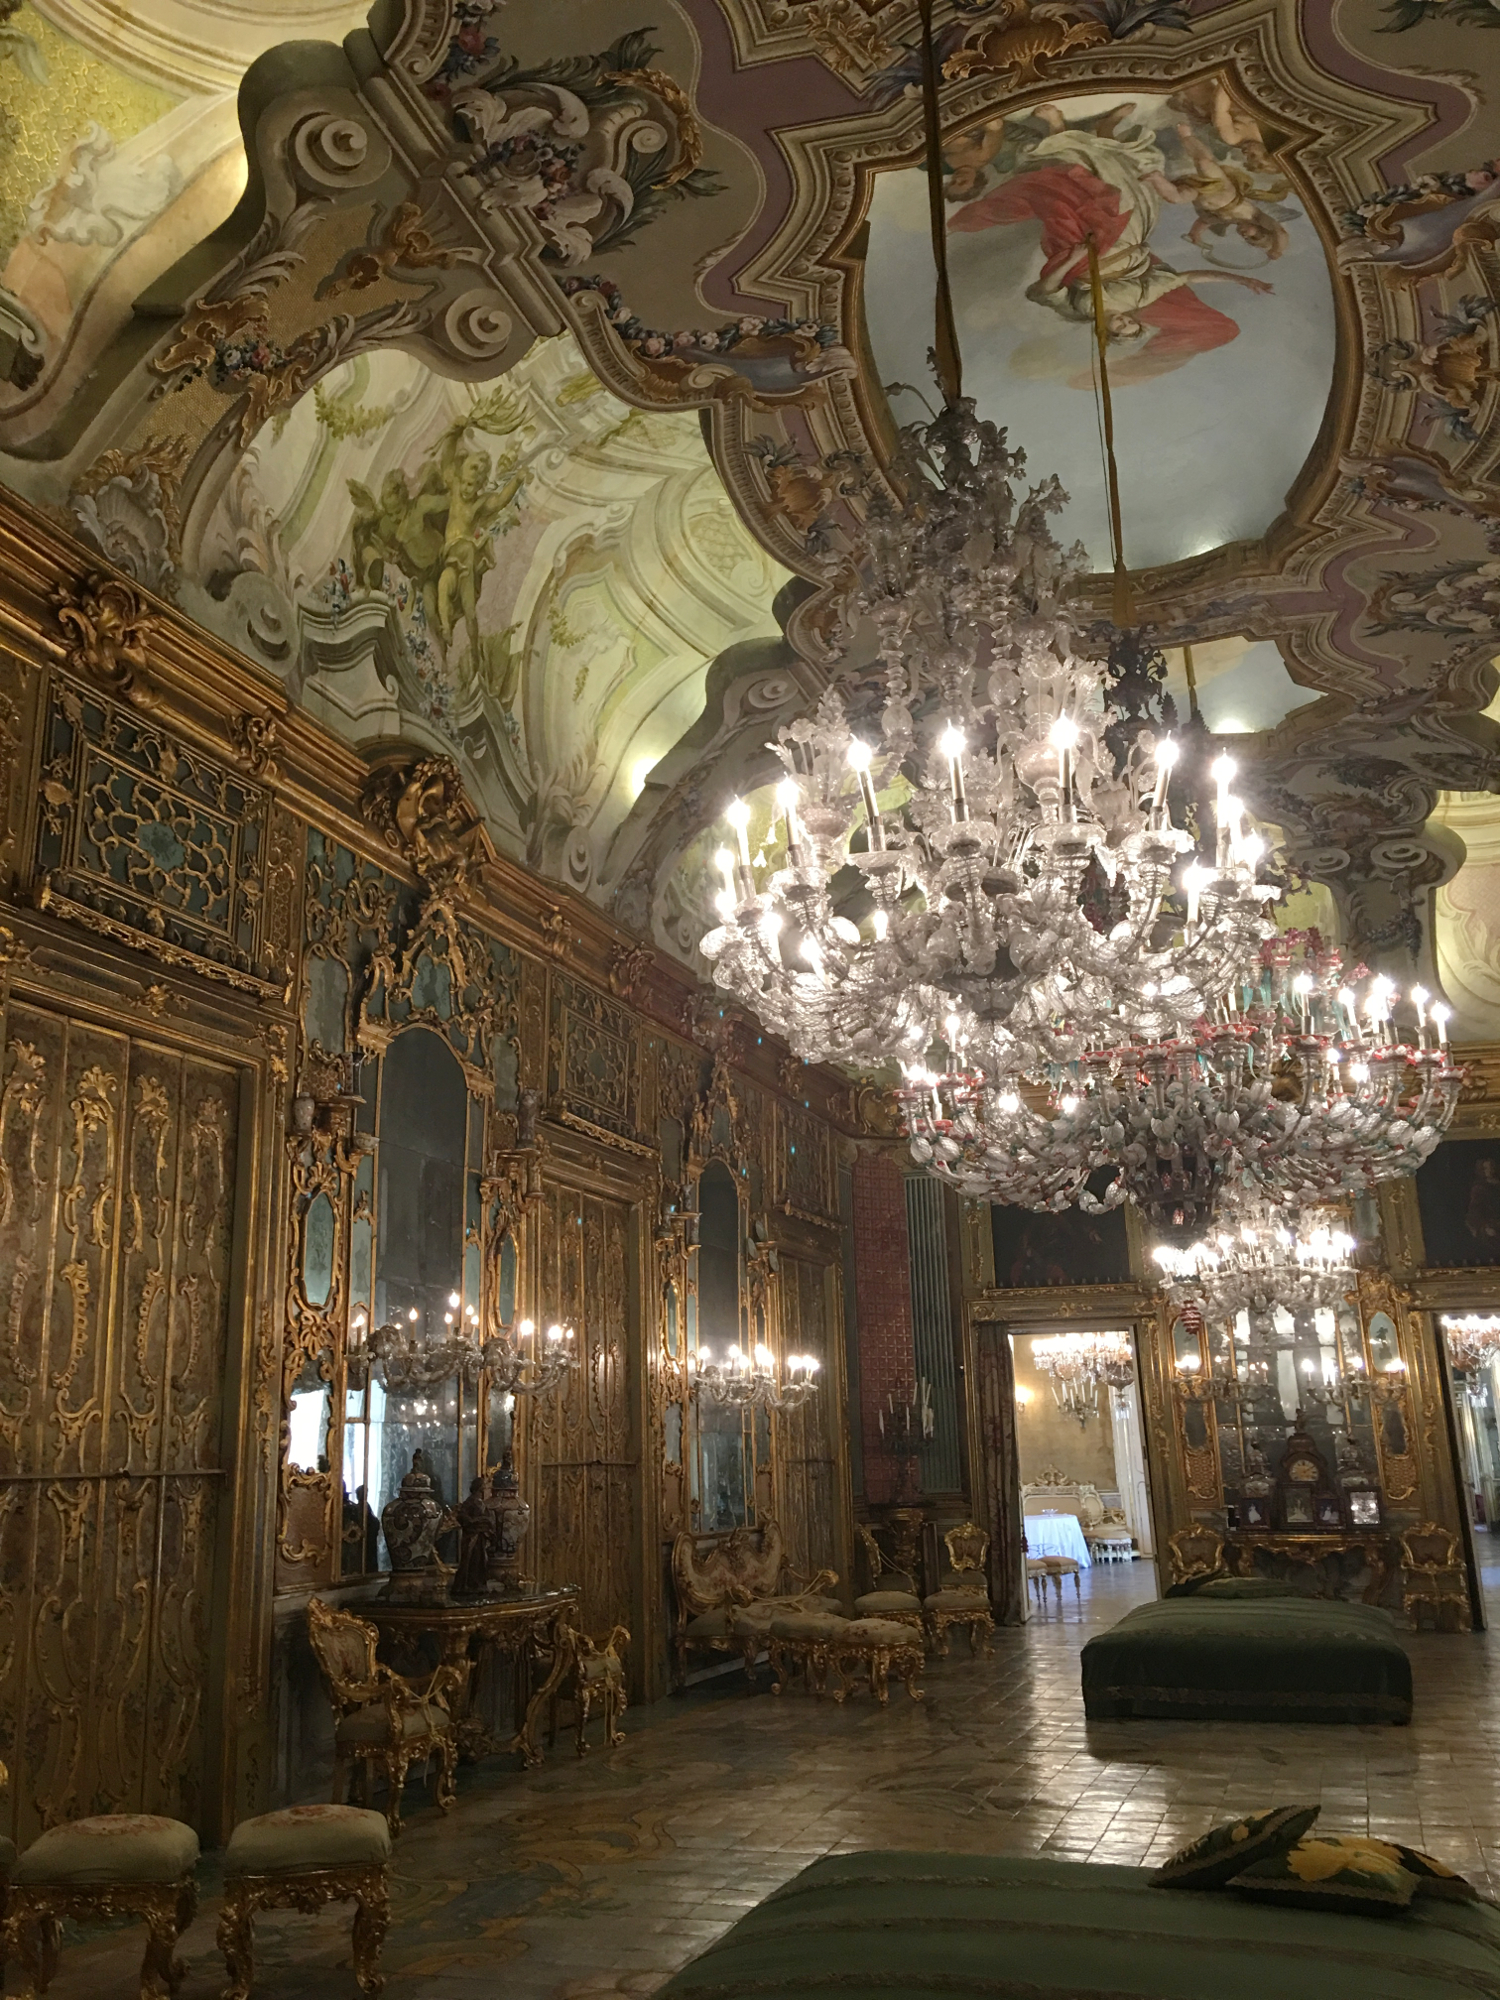 rocaille-blog-palermo-palazzo-valguarnera-gangi-gattopardo-7